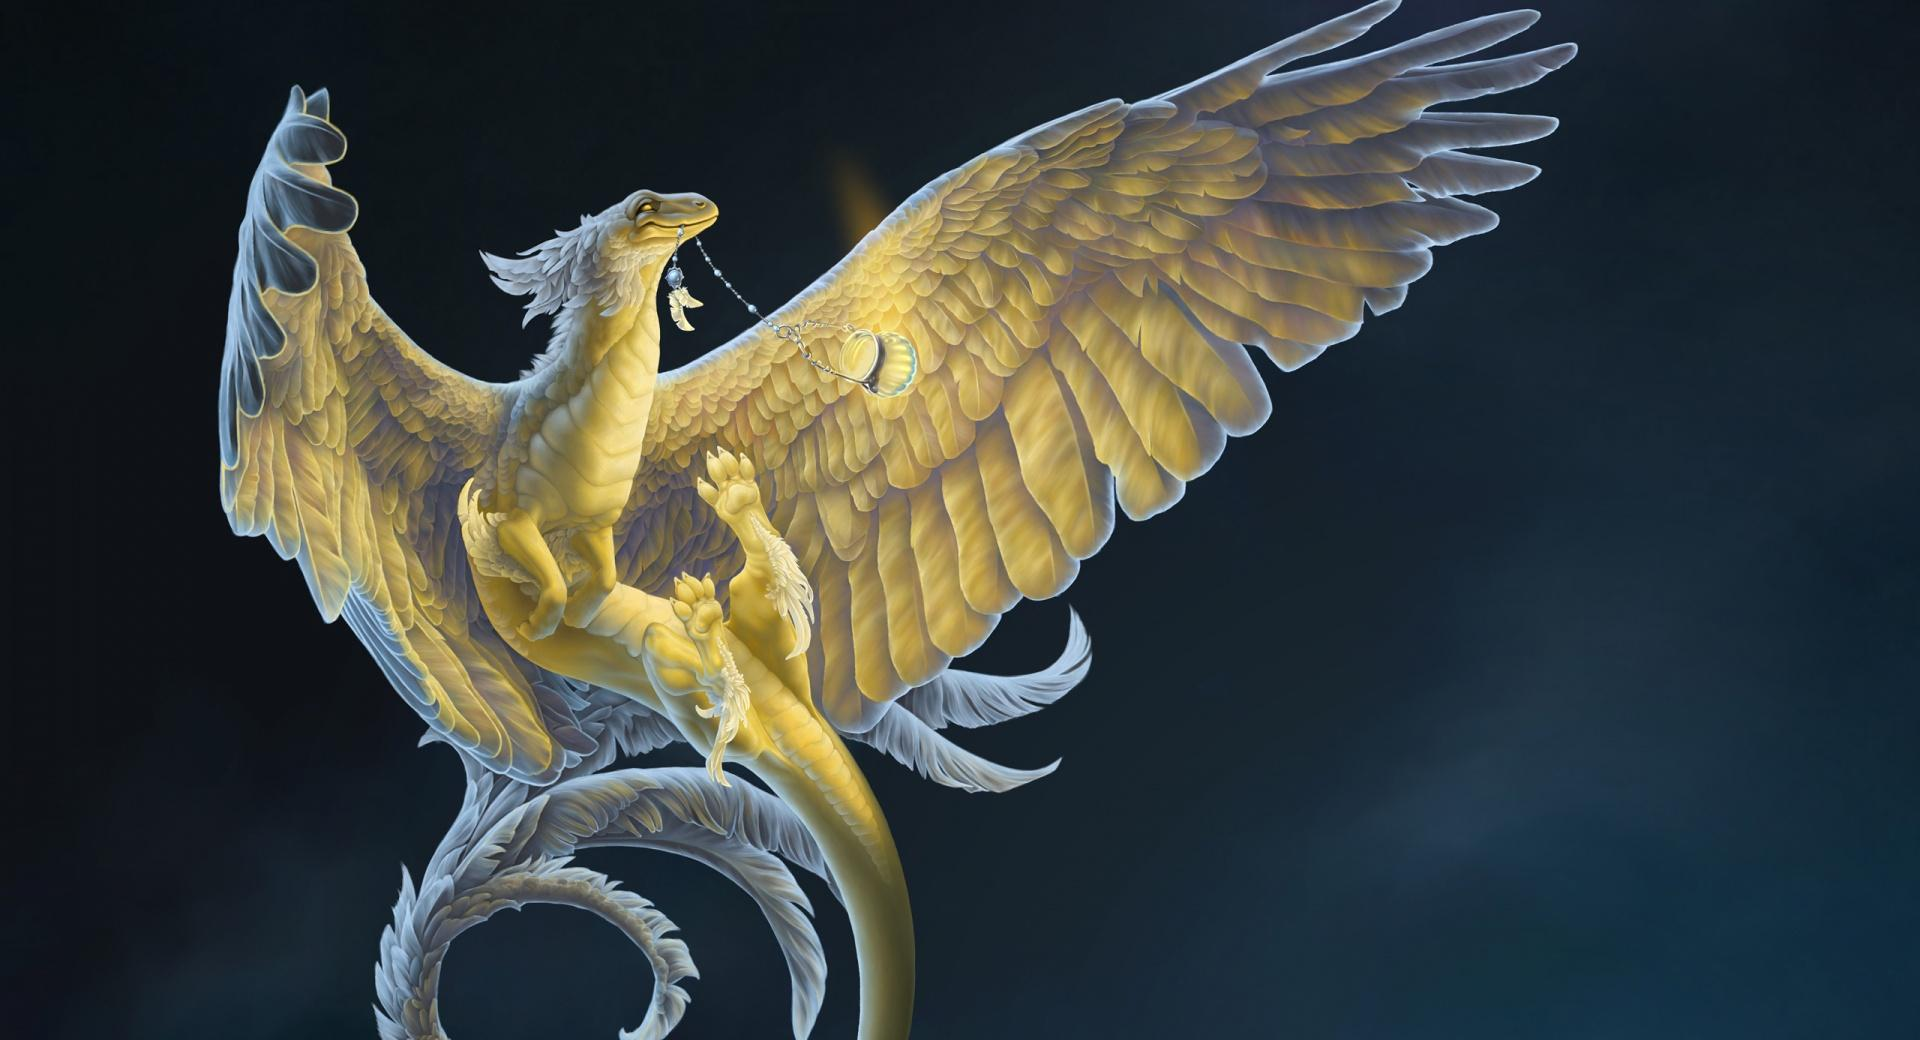 Night Dragon wallpapers HD quality